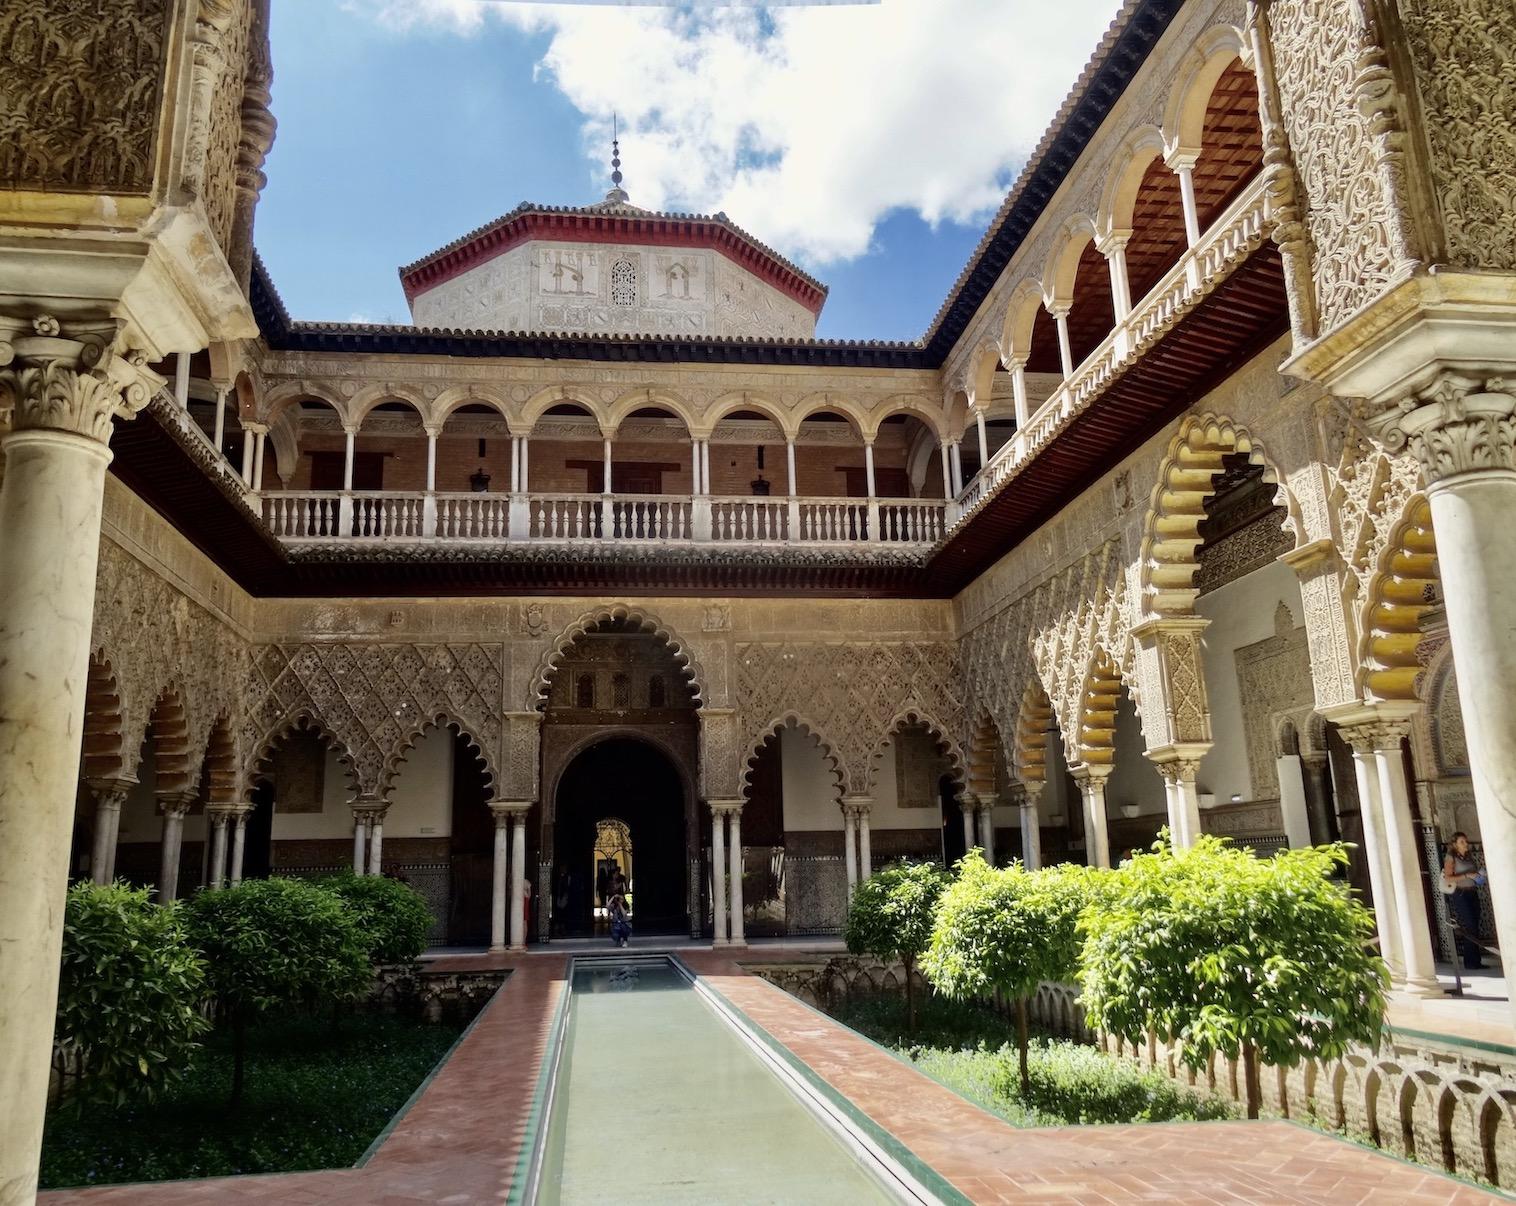 Visit The Alcazar in Seville.